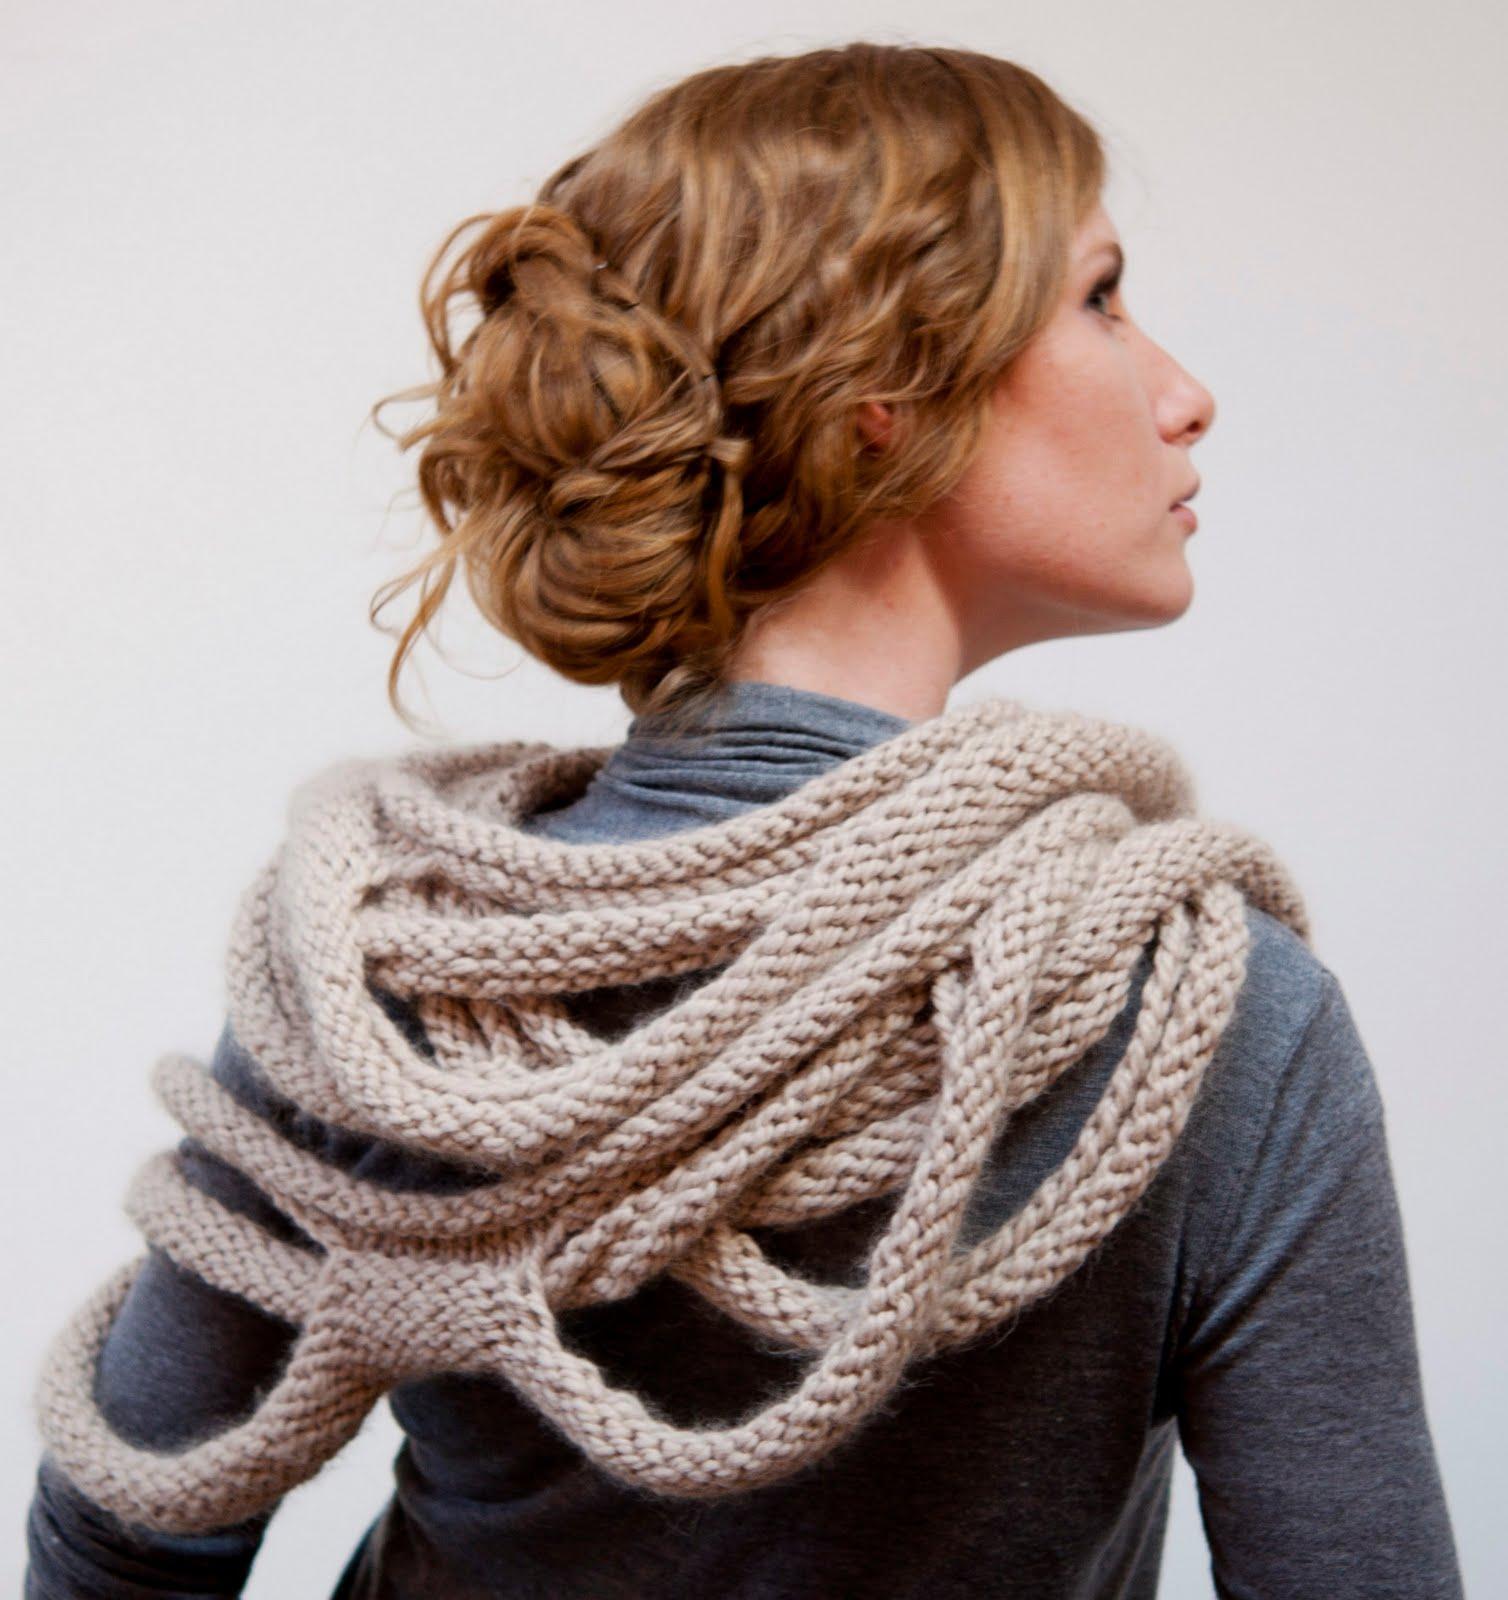 Simple Knitting Patterns For Kids : Ruby Submarine: Medusa Loop Scarf Knitting Pattern